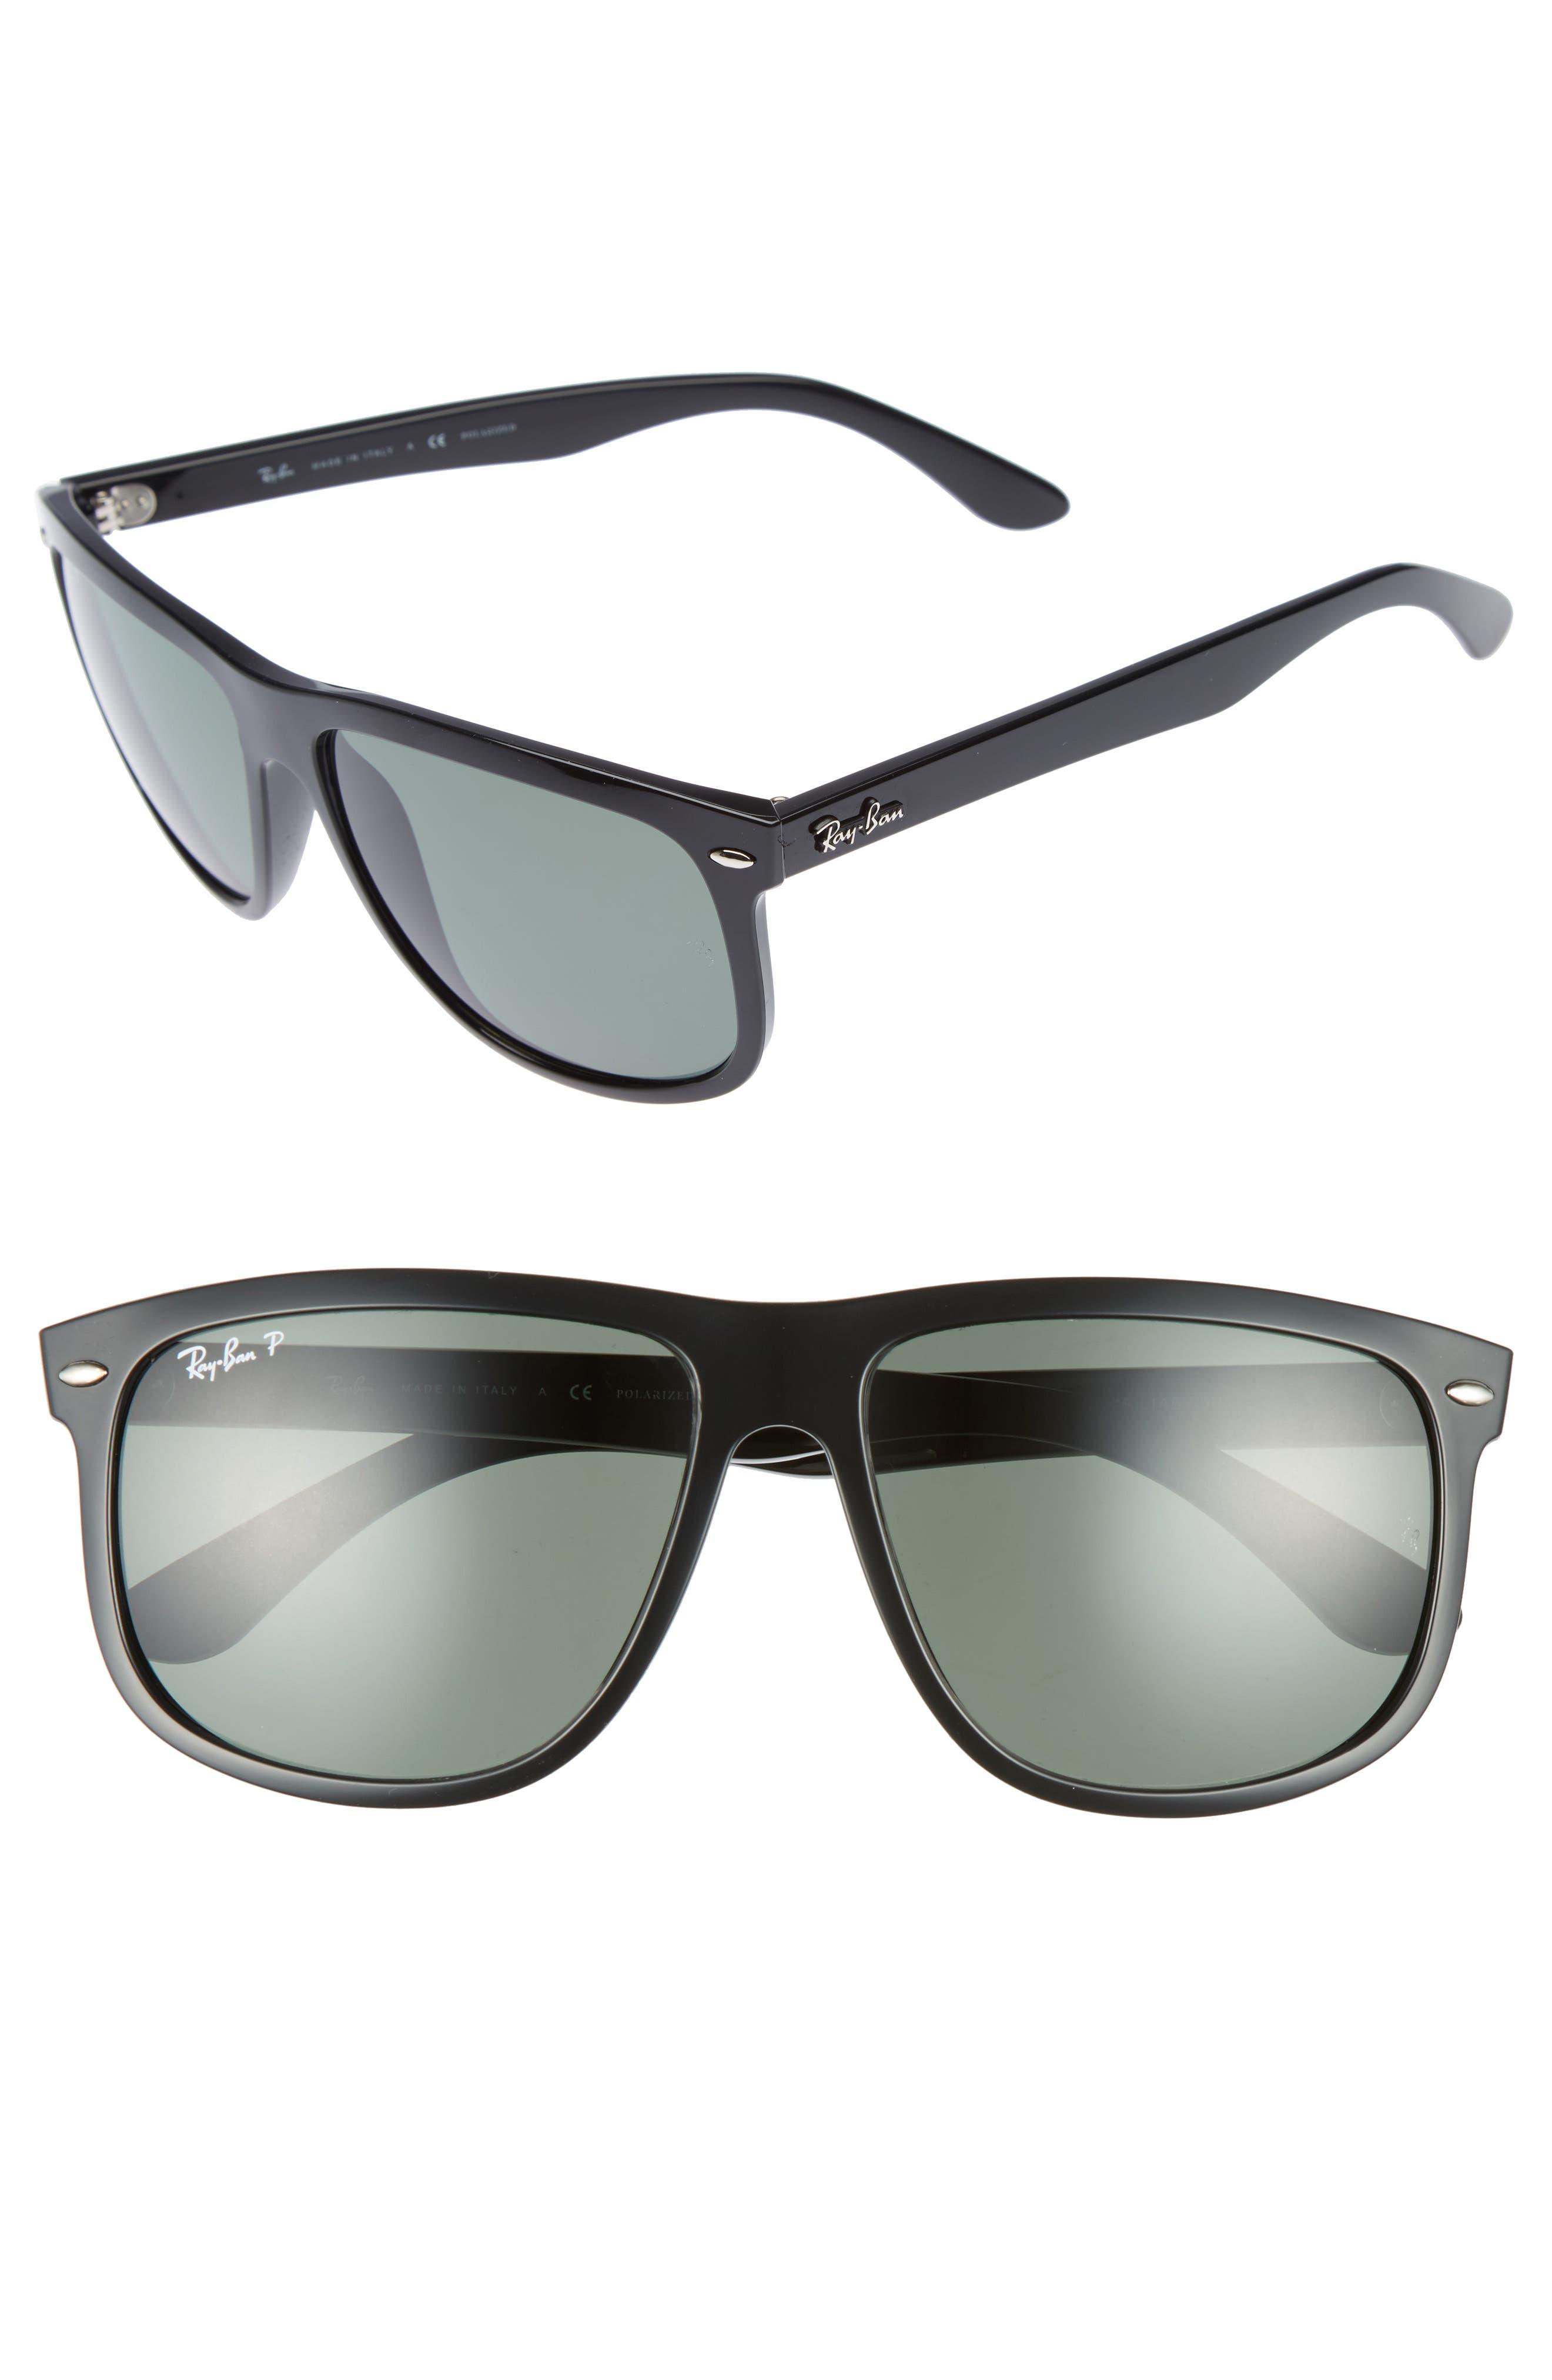 Ray-Ban Highstreet 60Mm Polarized Flat Top Sunglasses -